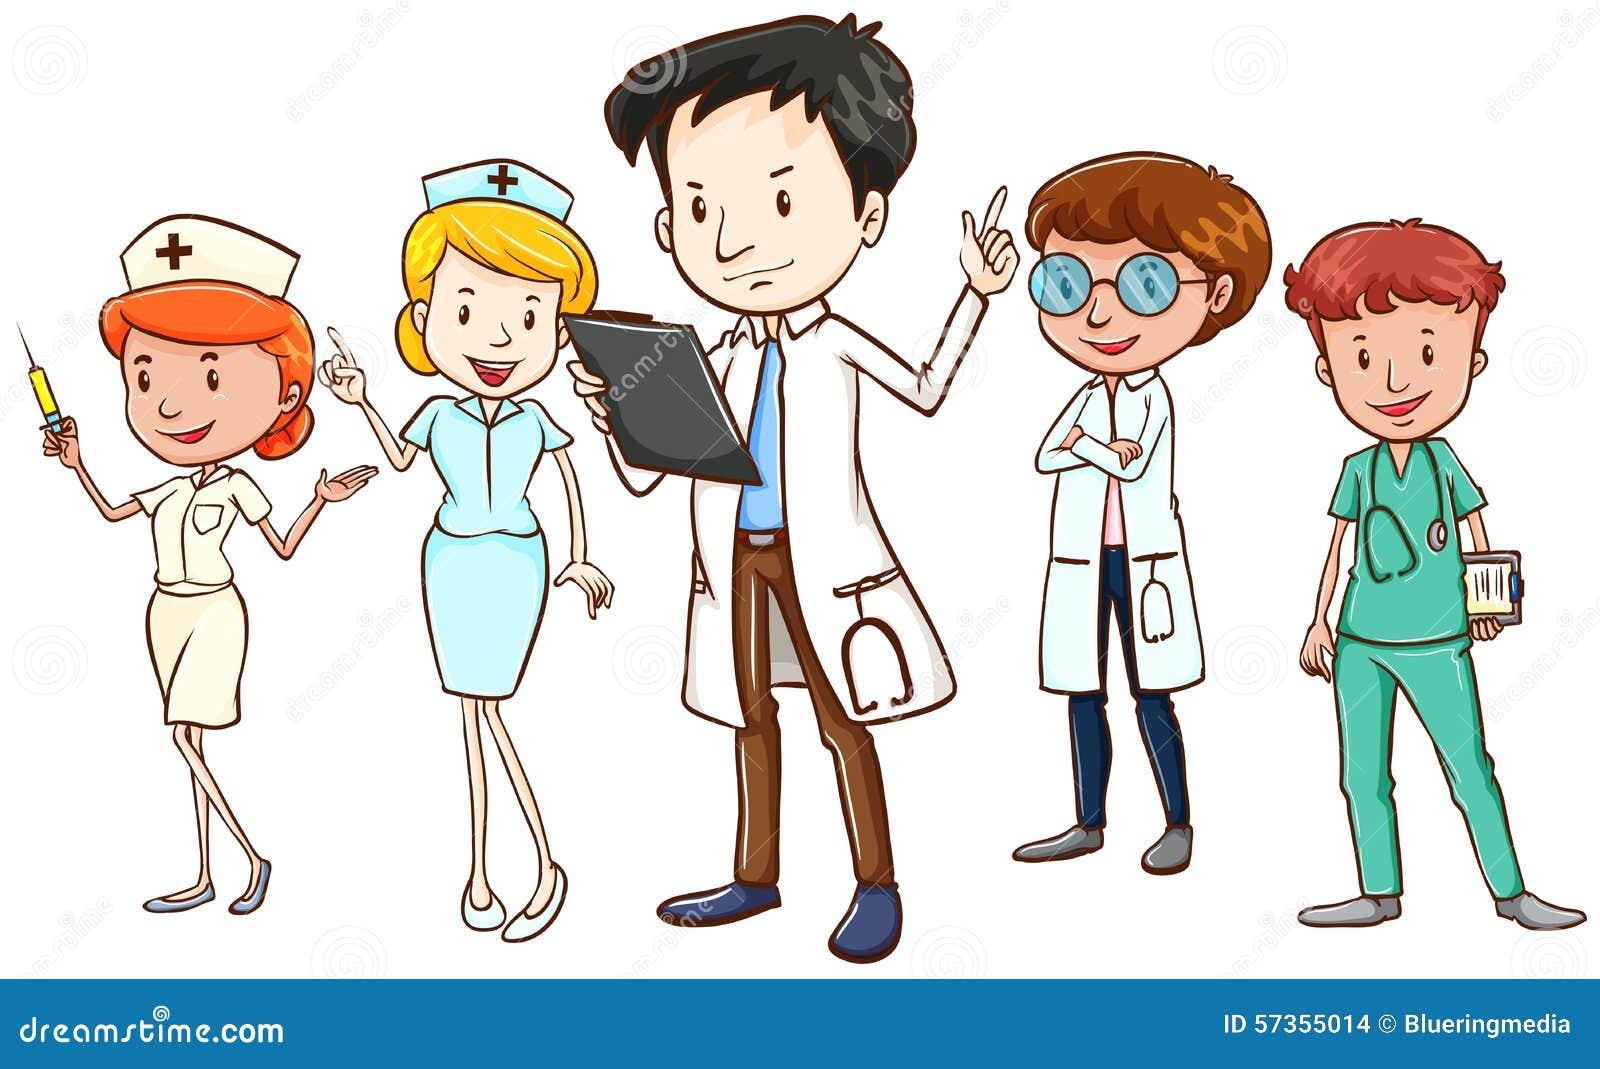 2 doctors team up on blonde milf 10